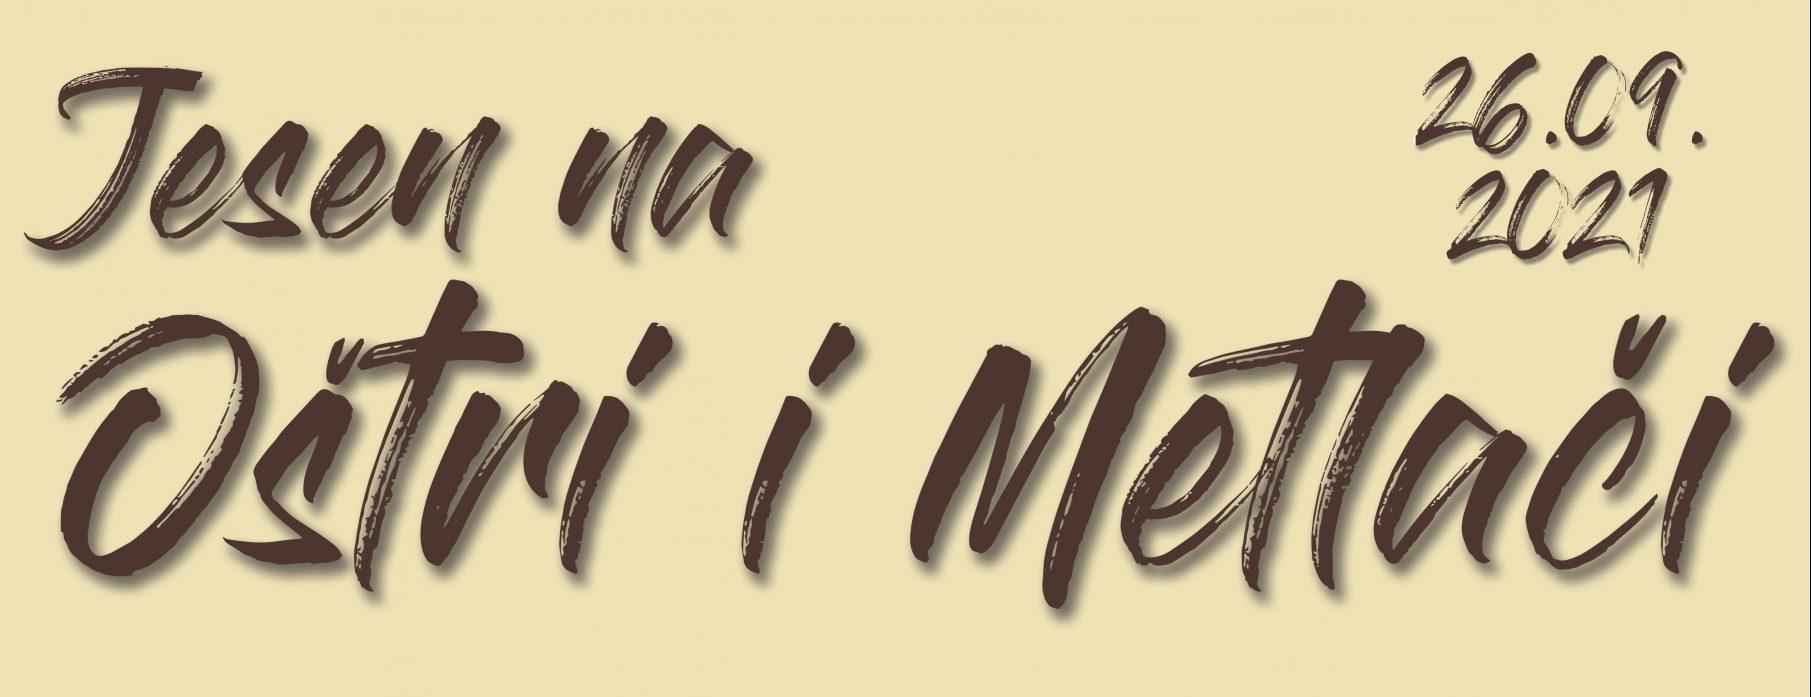 Jesen na Oštri i Metlači 2021 – Poziv 26.9.2021.